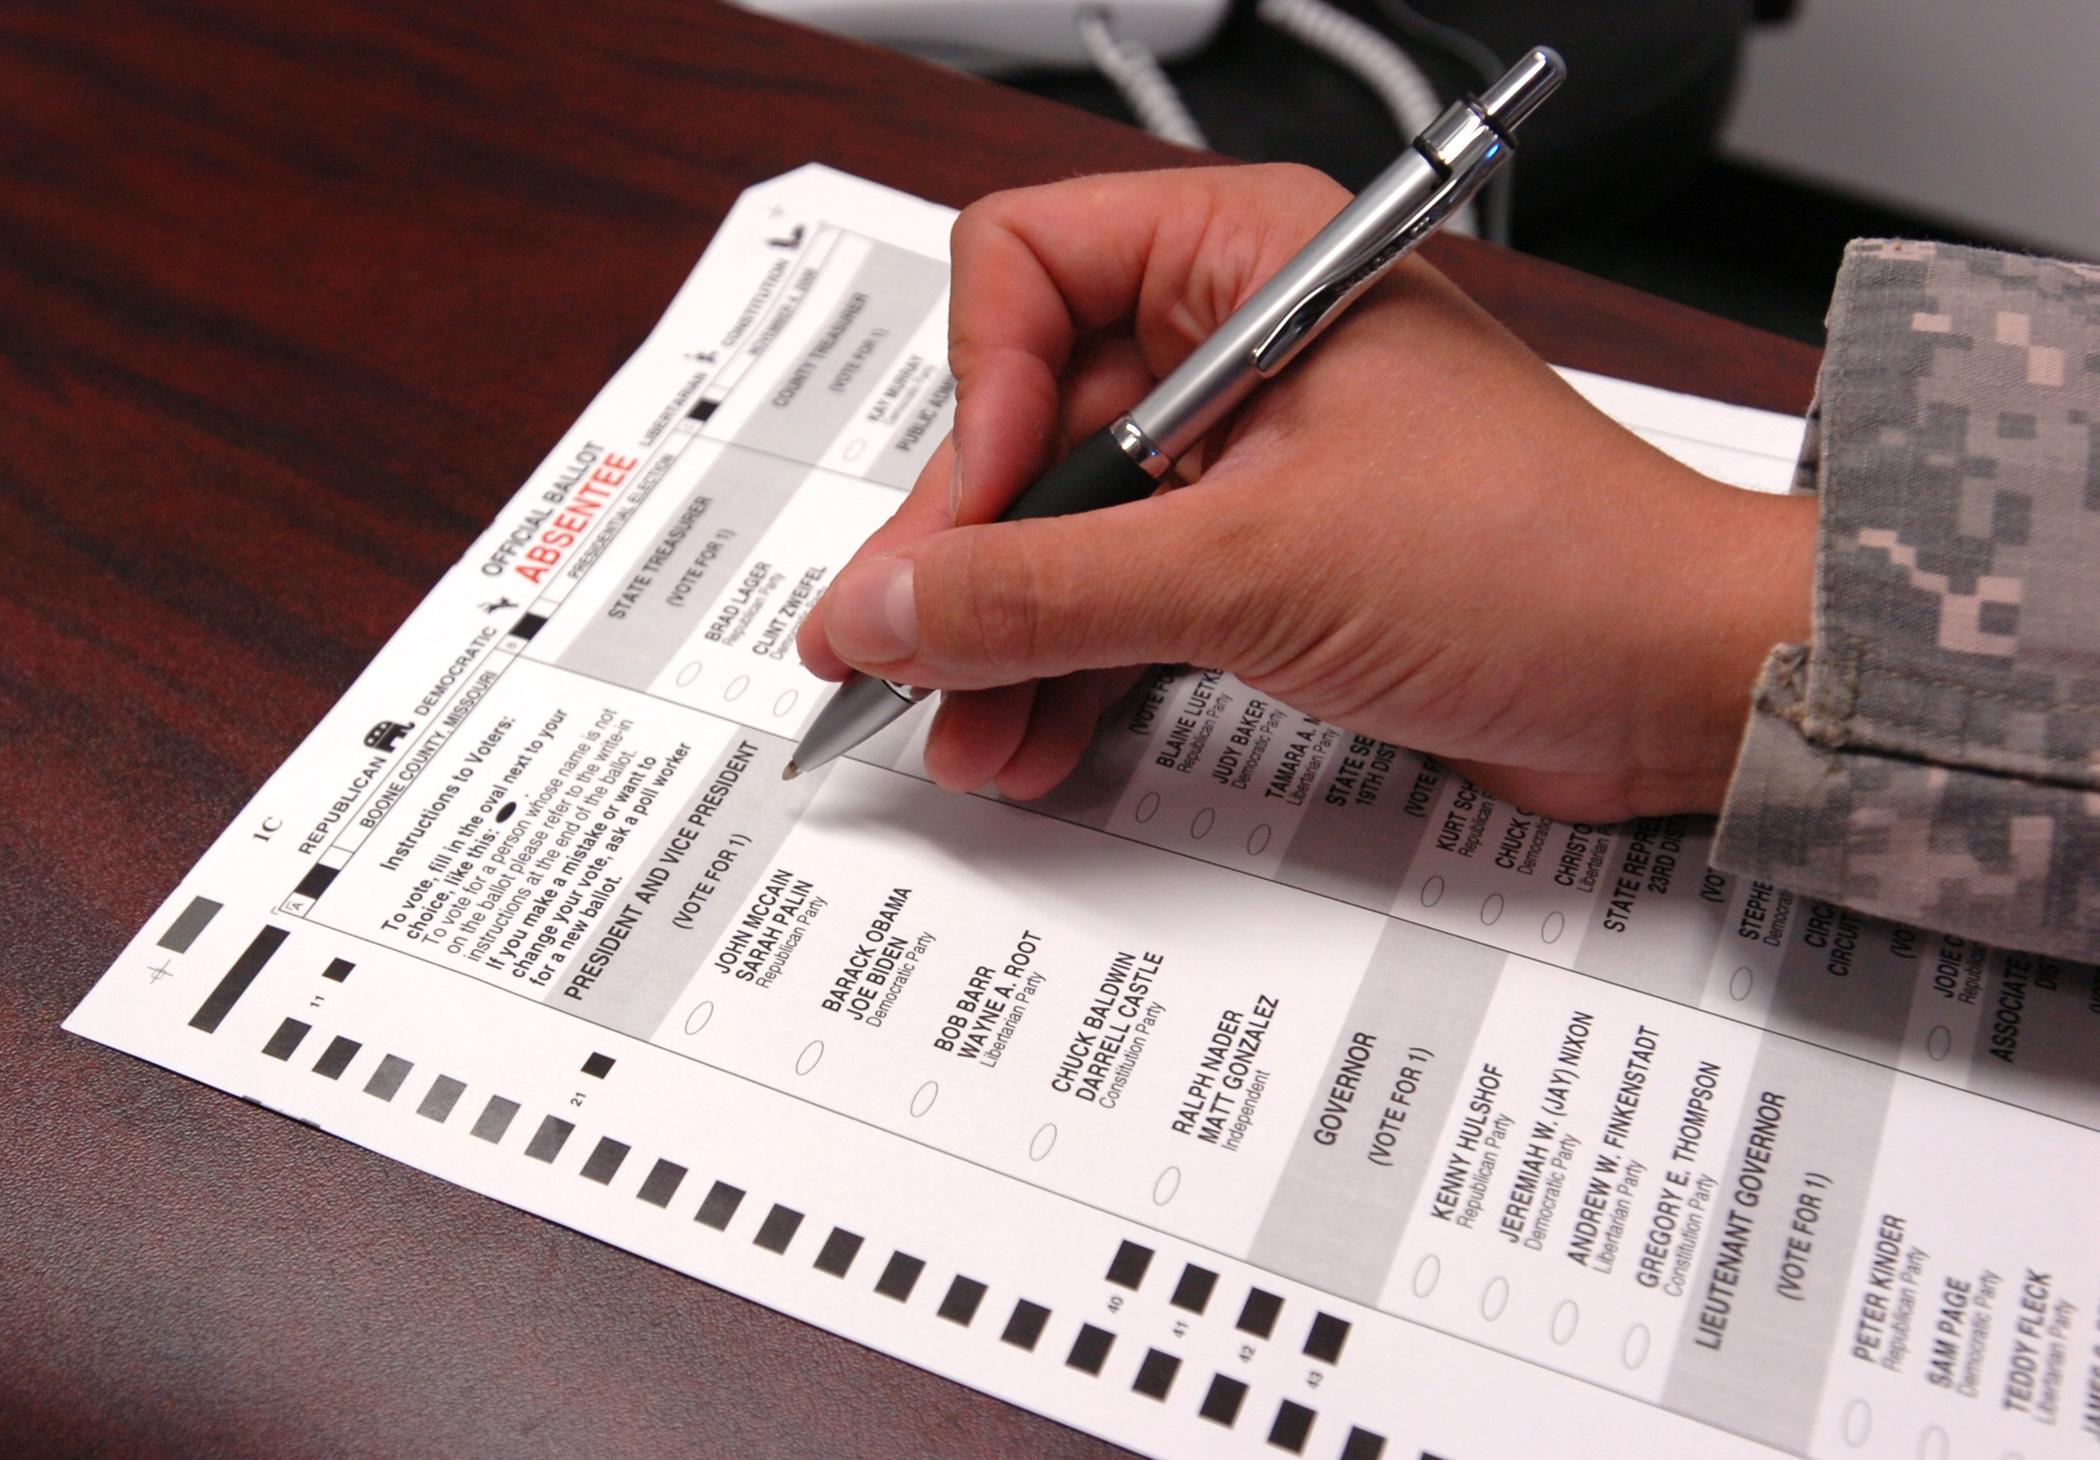 Federal judge allows North Carolina to count absentee ballots postmarked through November 12